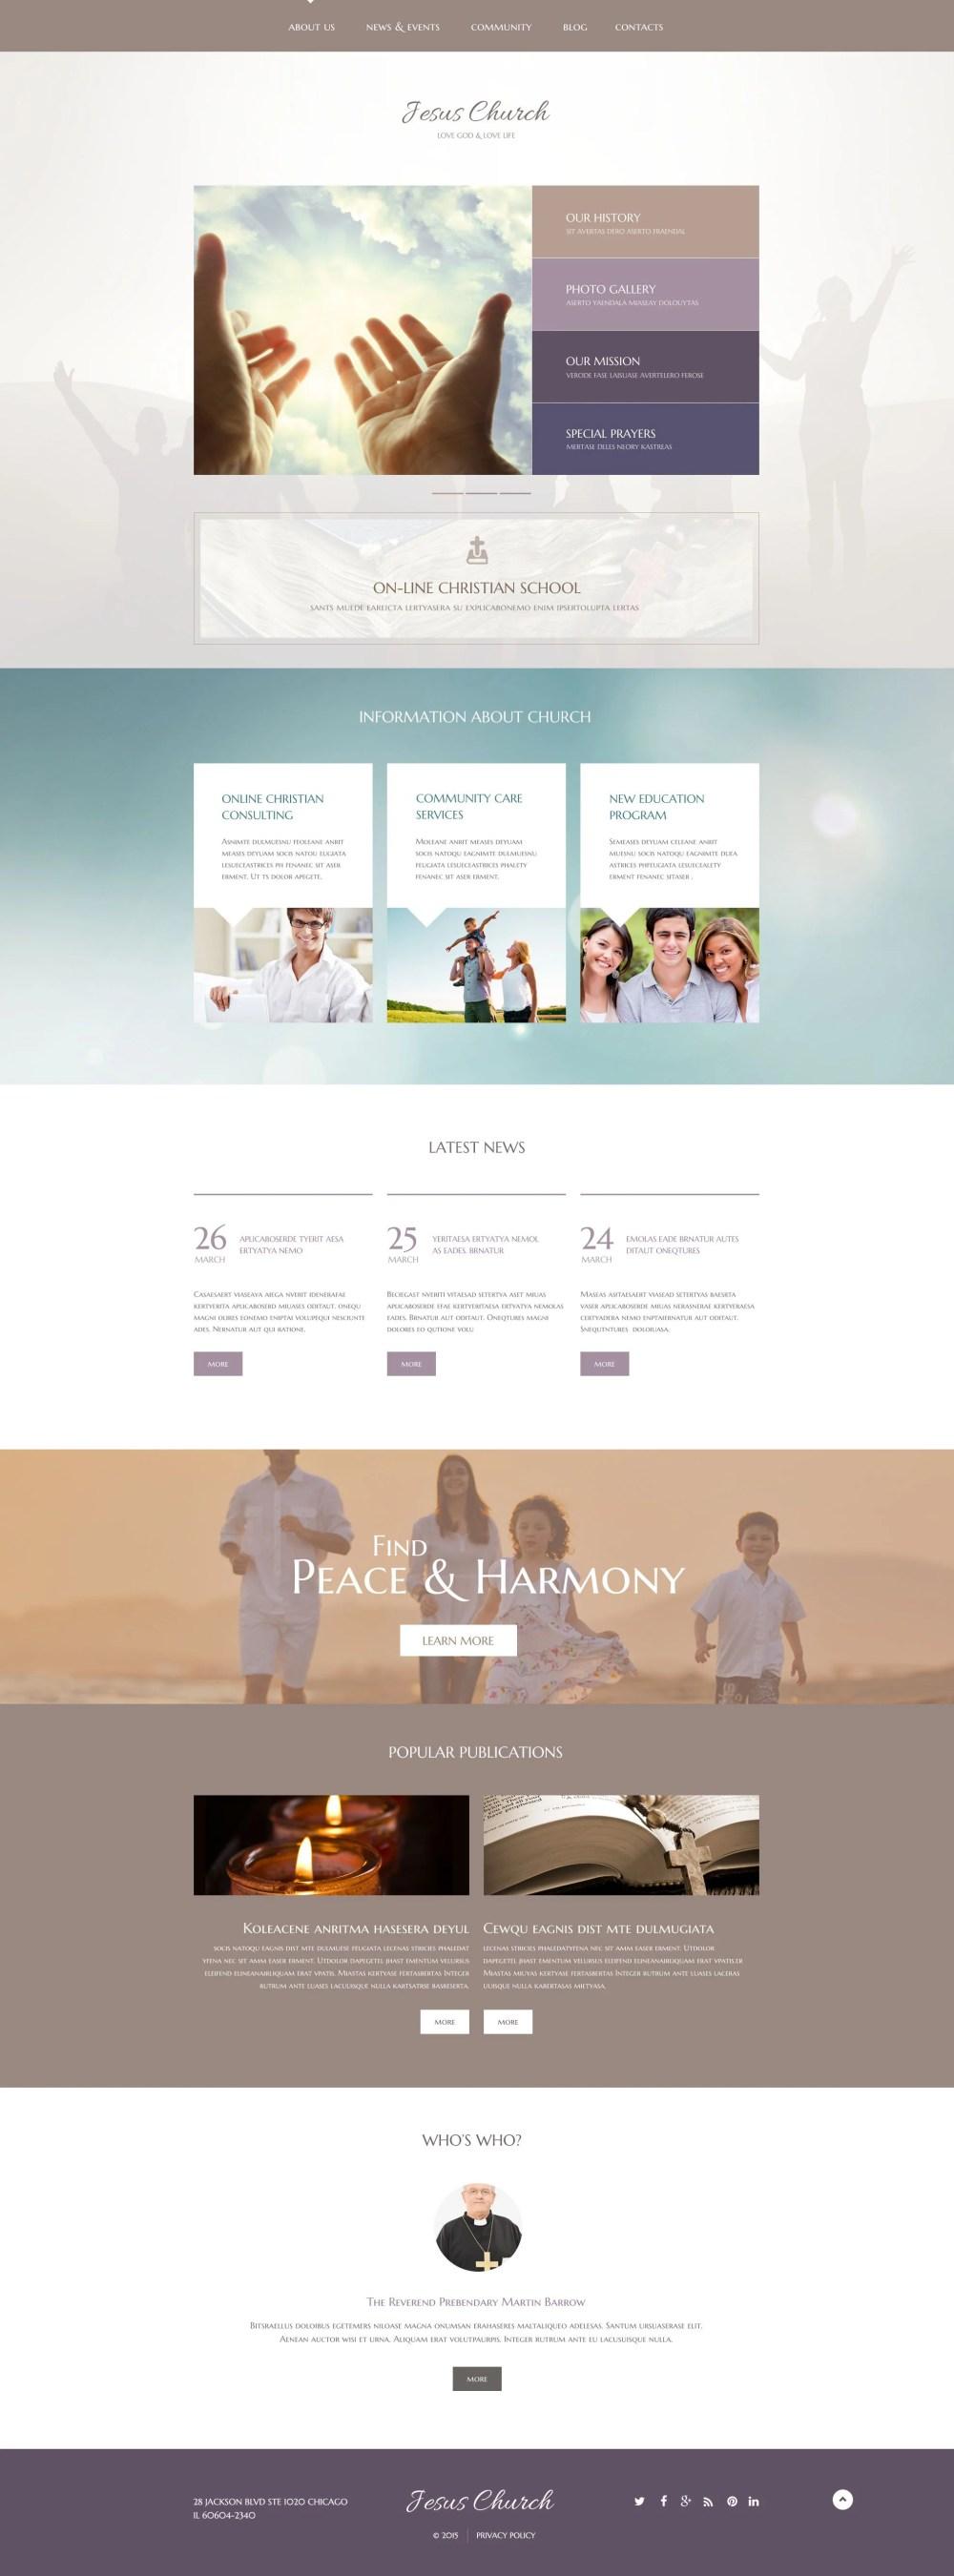 medium resolution of jesus church wordpress theme